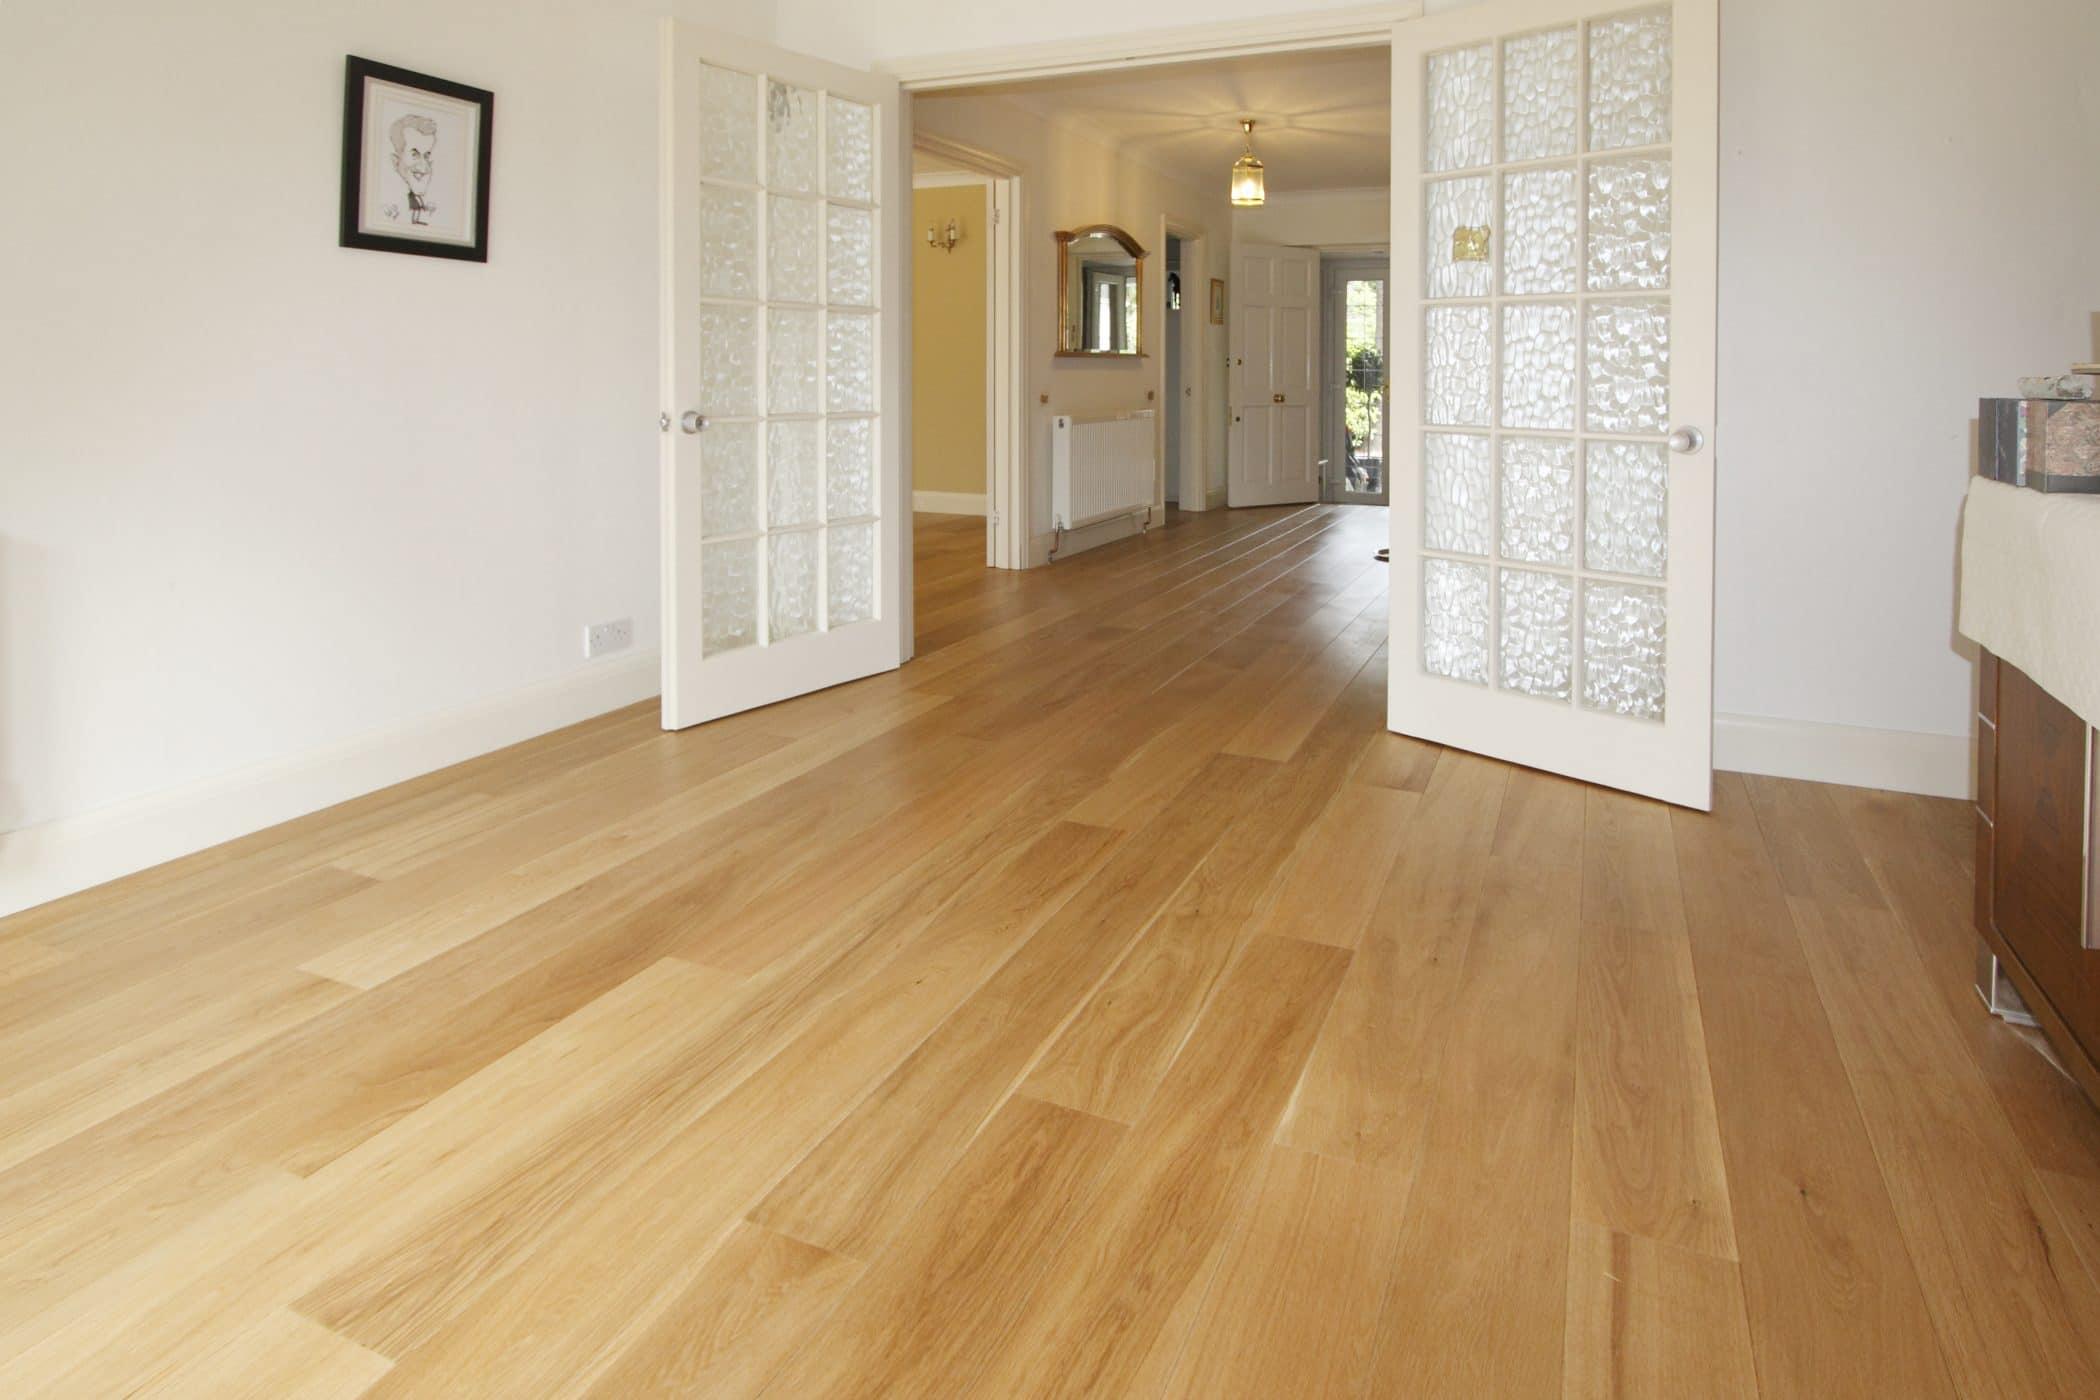 Aliyar1 – UK Wood Floors & Bespoke Joinery